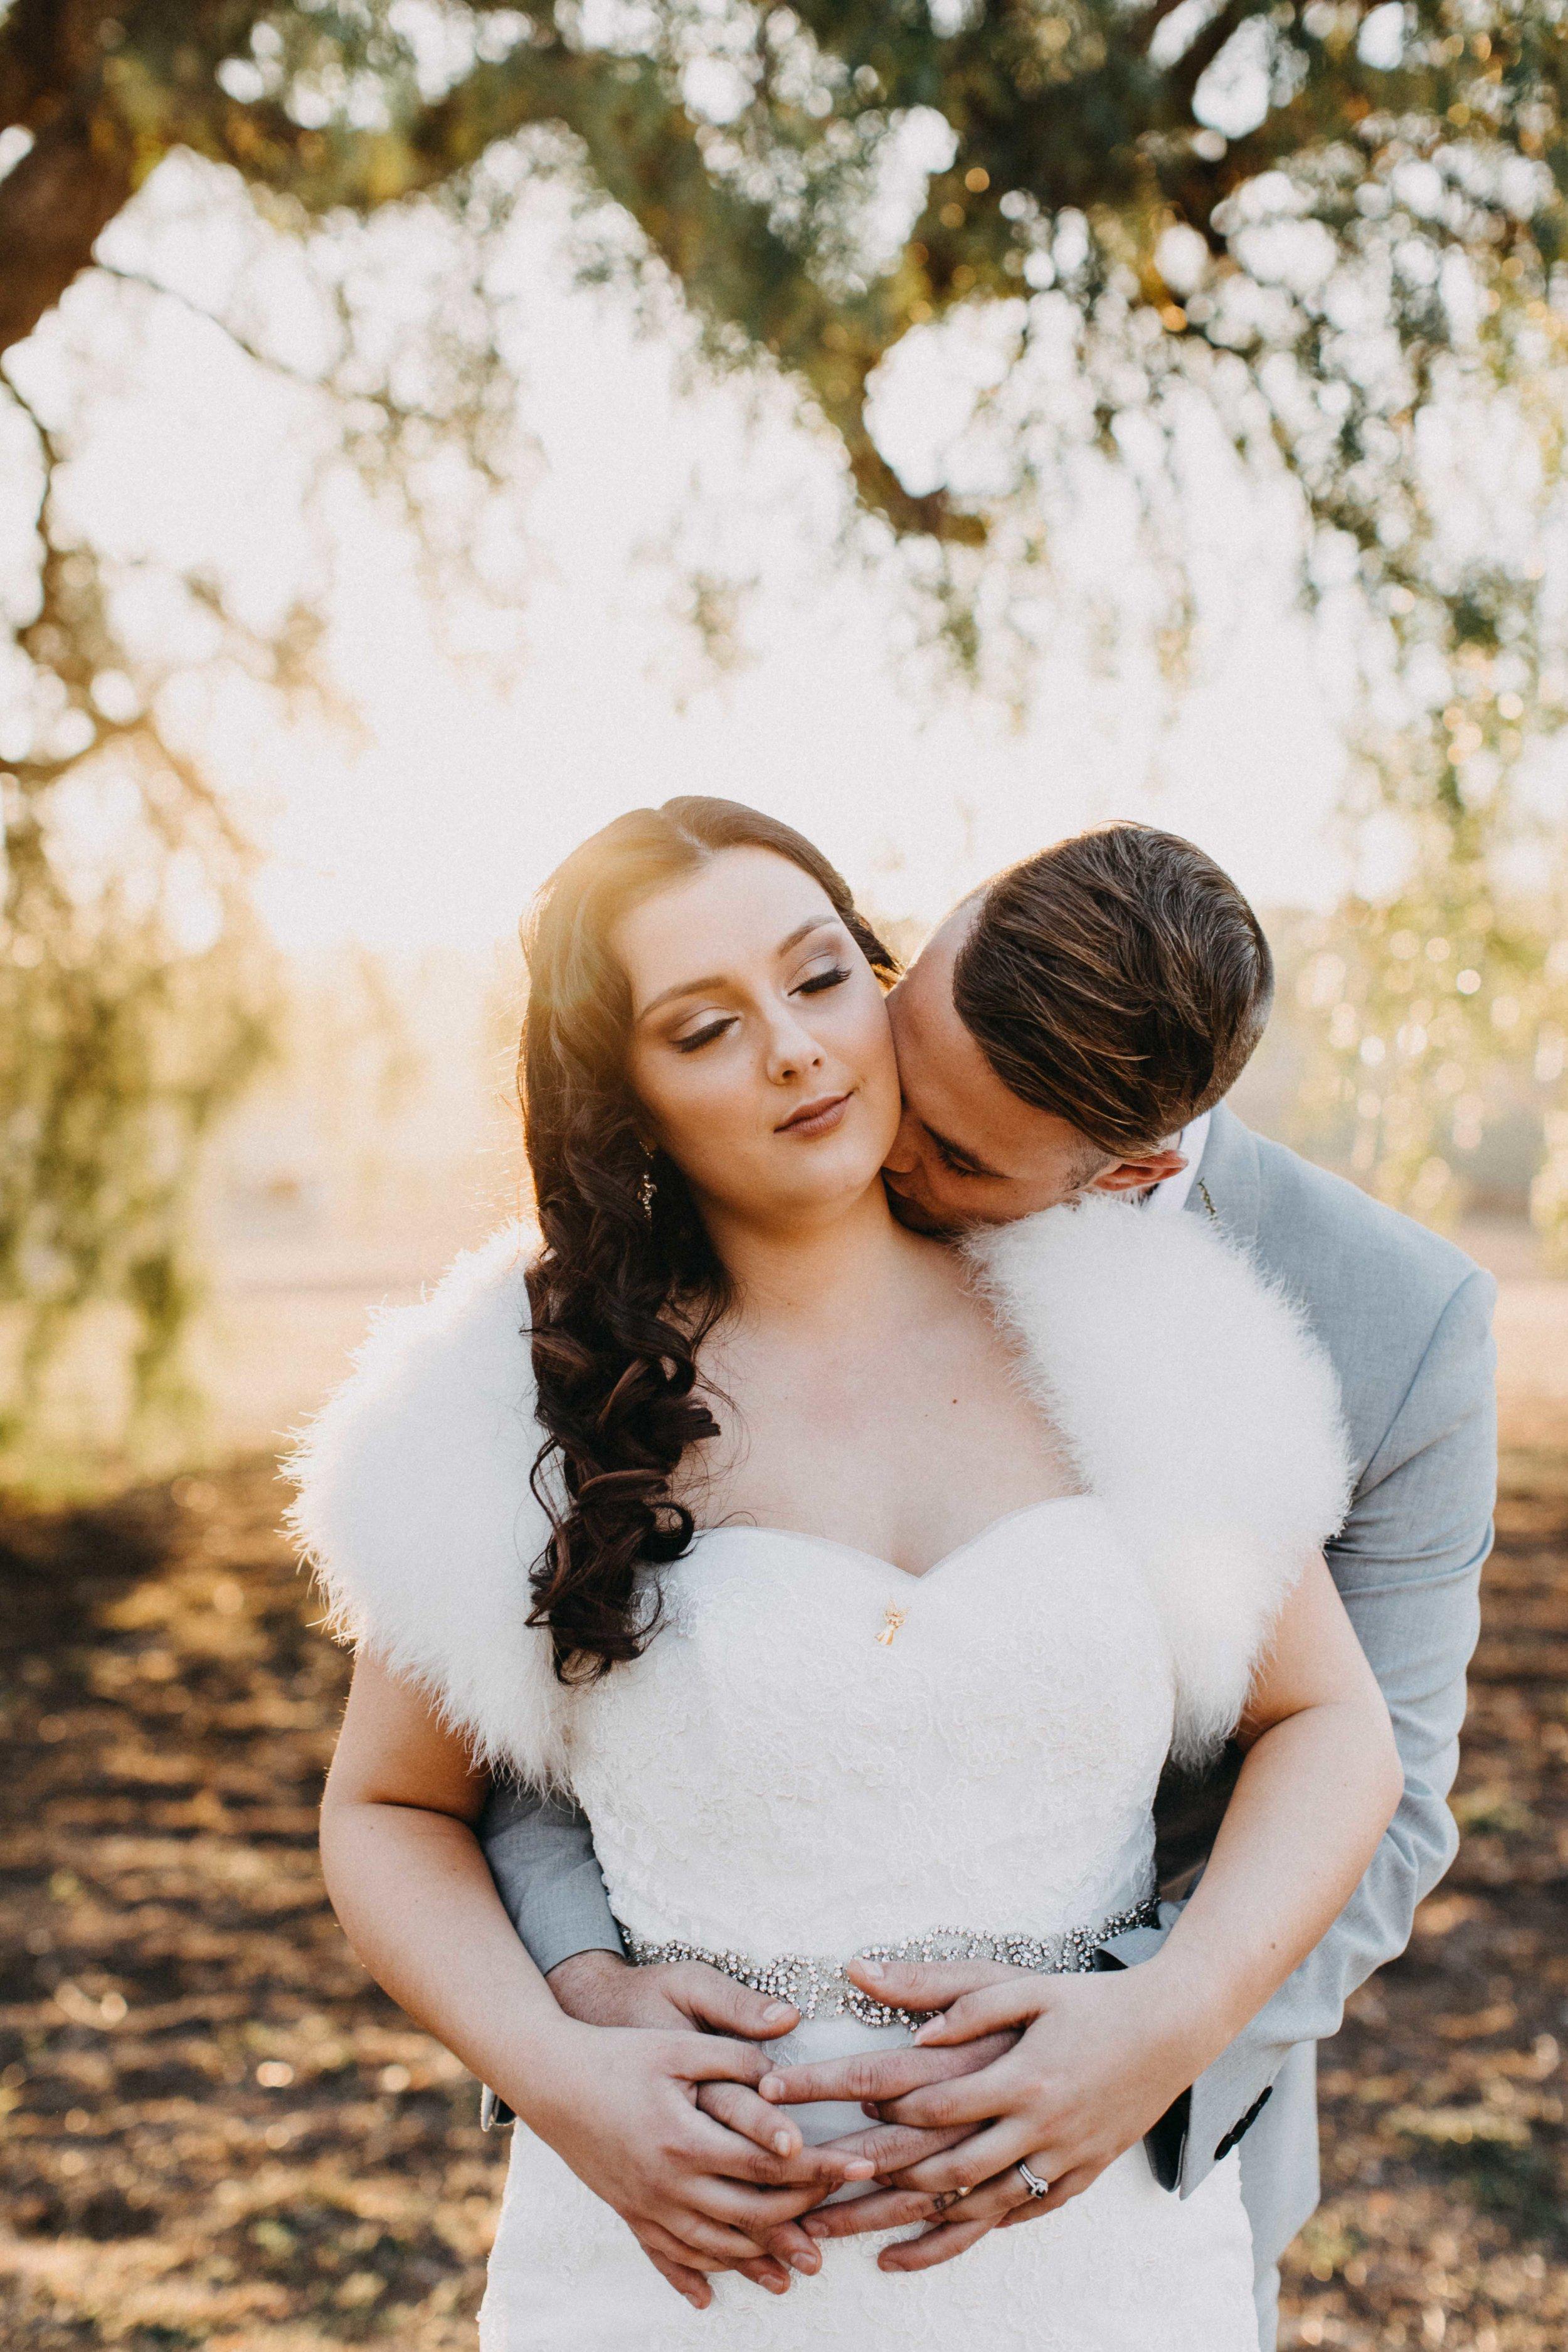 burnham-grove-camden-wedding-emilyobrienphotography-macarthur-124.jpg